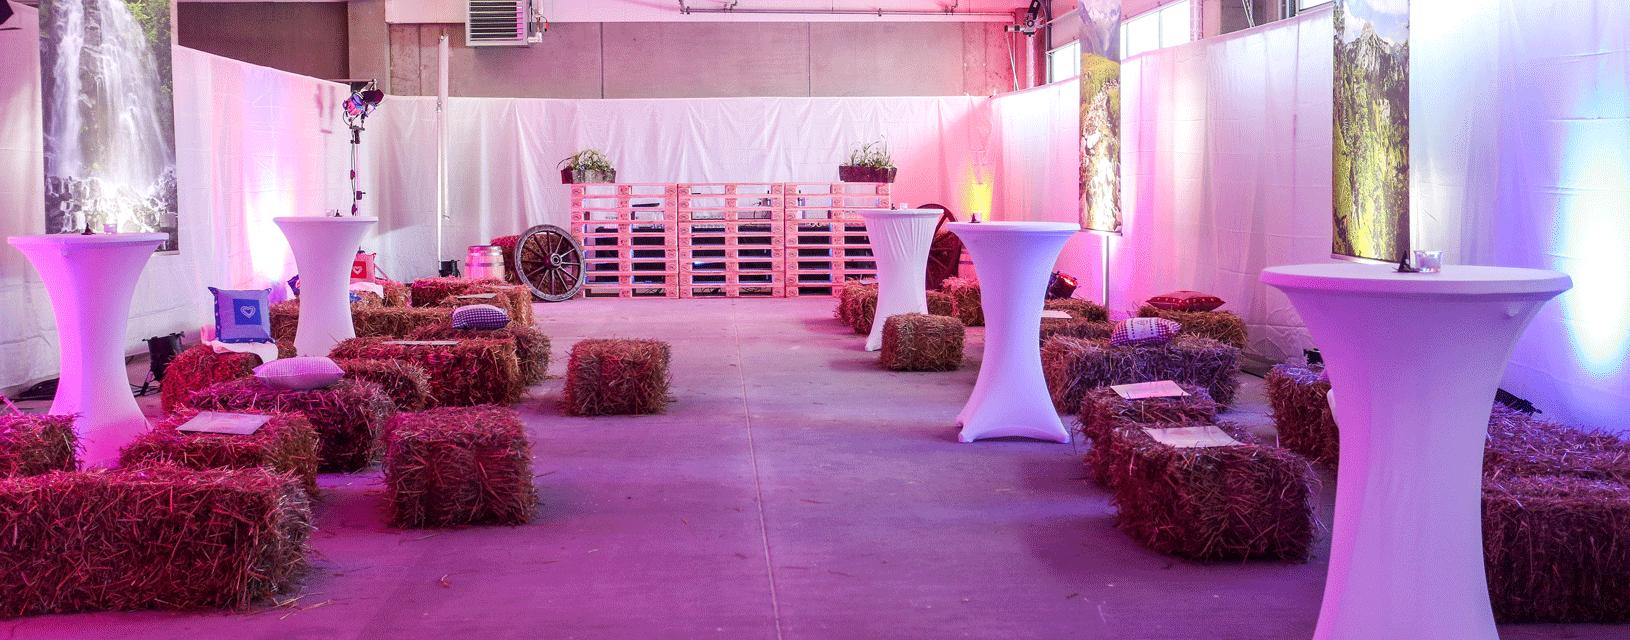 event-agentur-muenchen-lounge